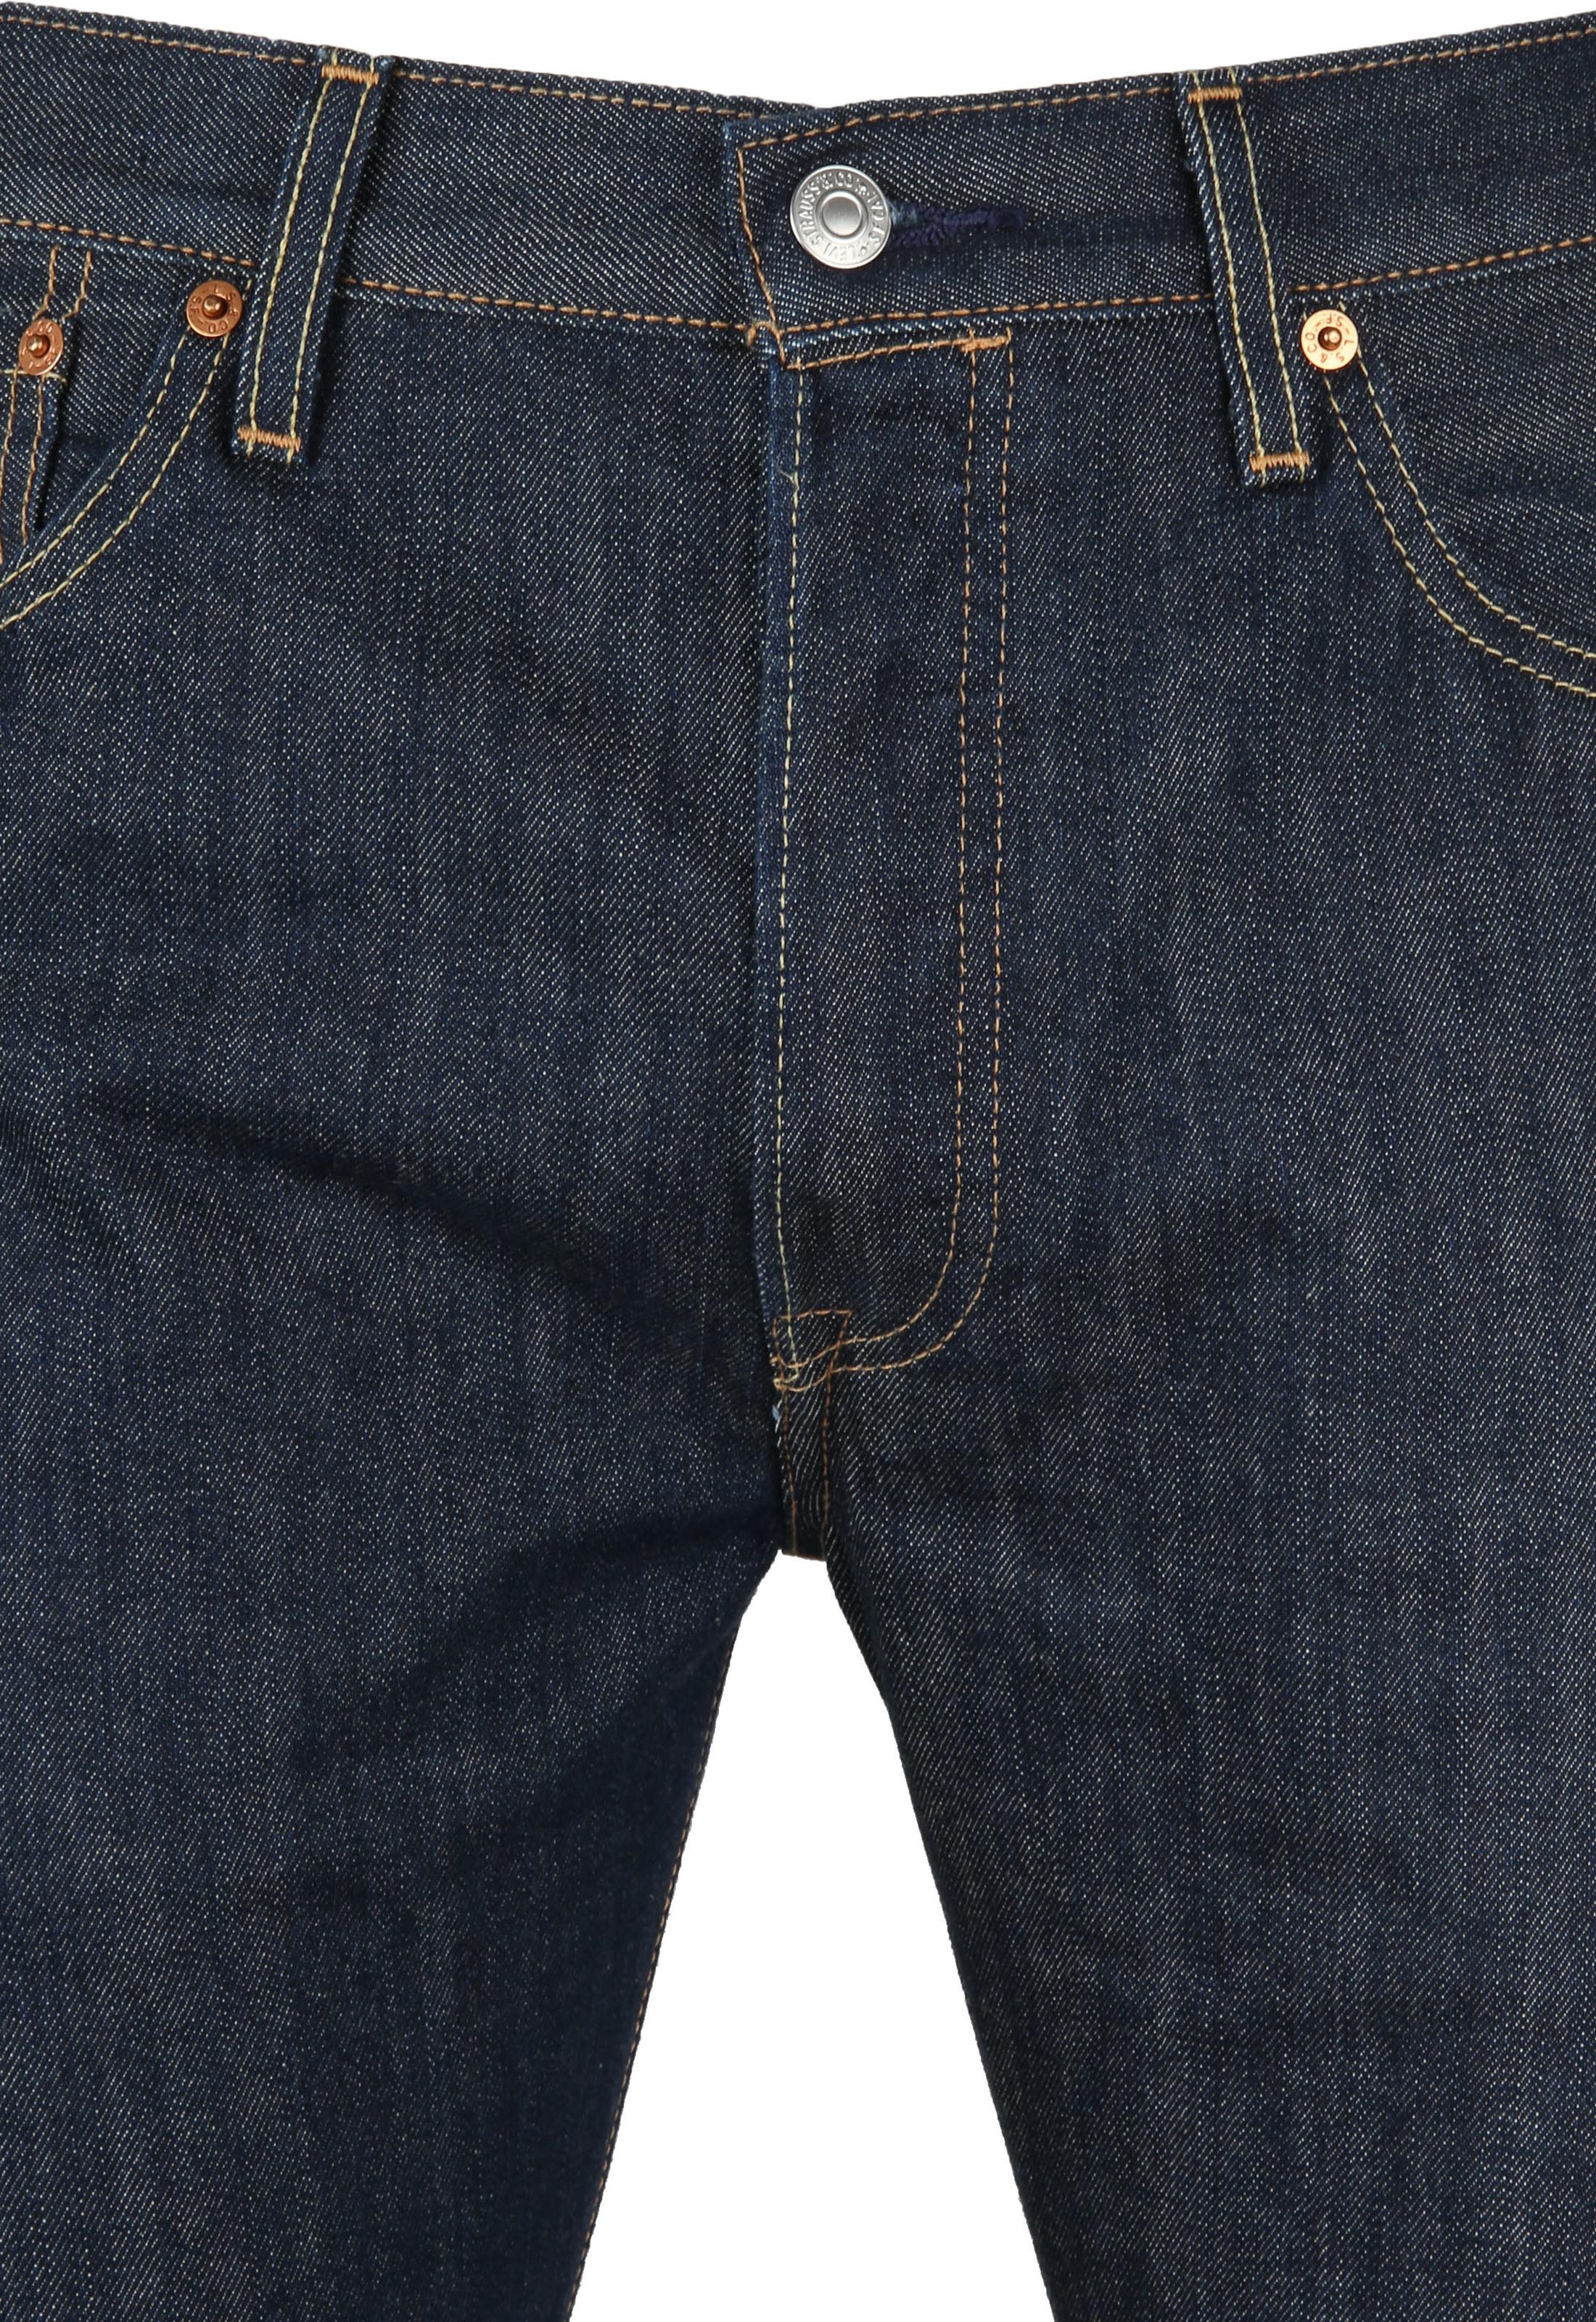 Levi s Jeans 501 Original Fit 0162 00501-0162 Marlon order online ... d3bb762de8f96